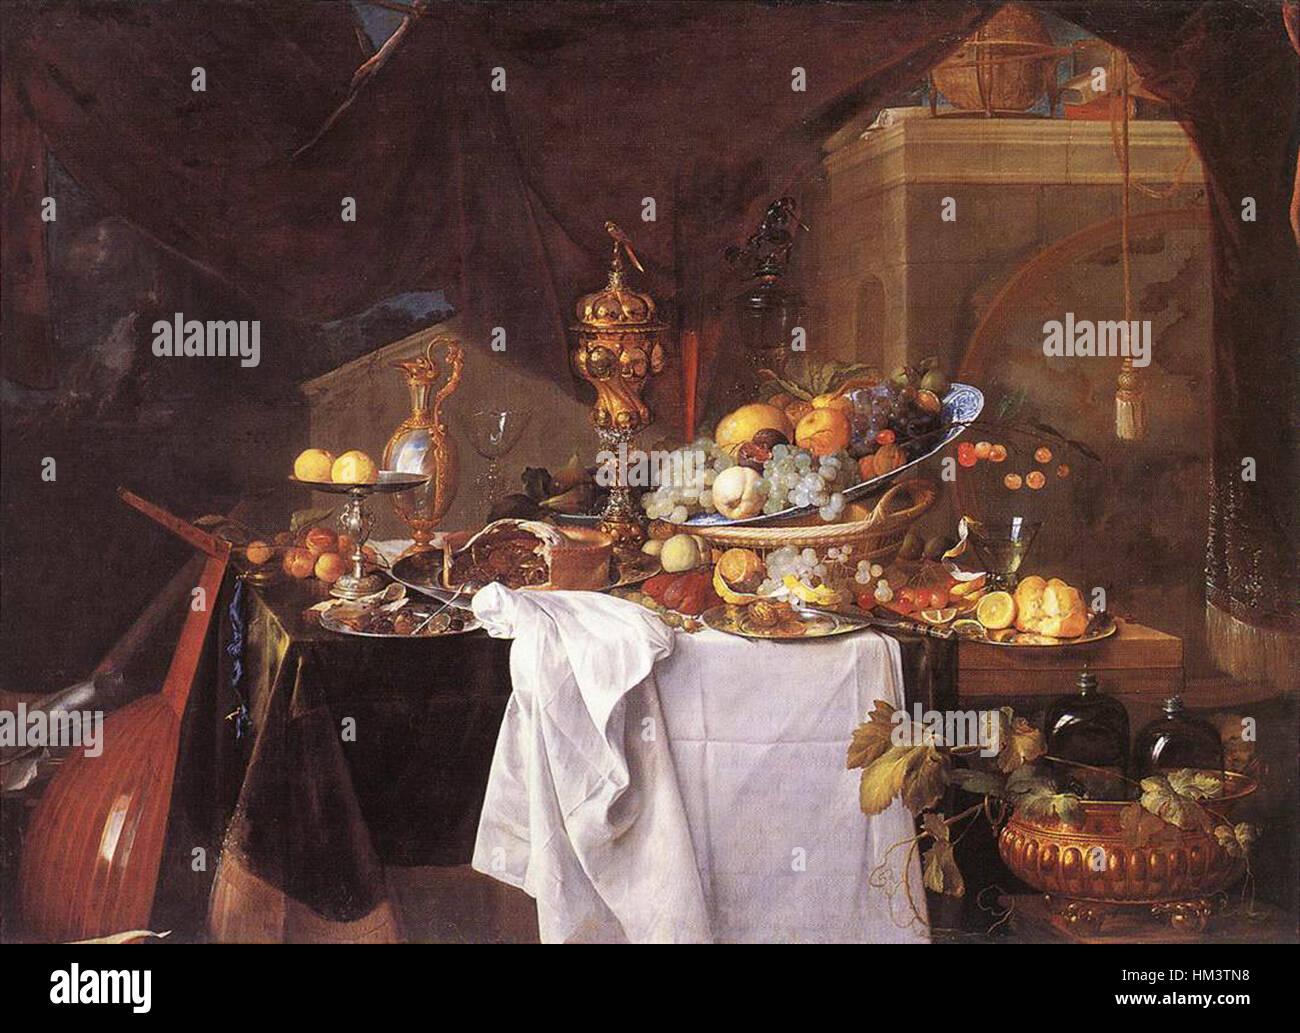 Jan Davidsz. de Heem - A Table of Desserts - WGA11289 Stock Photo